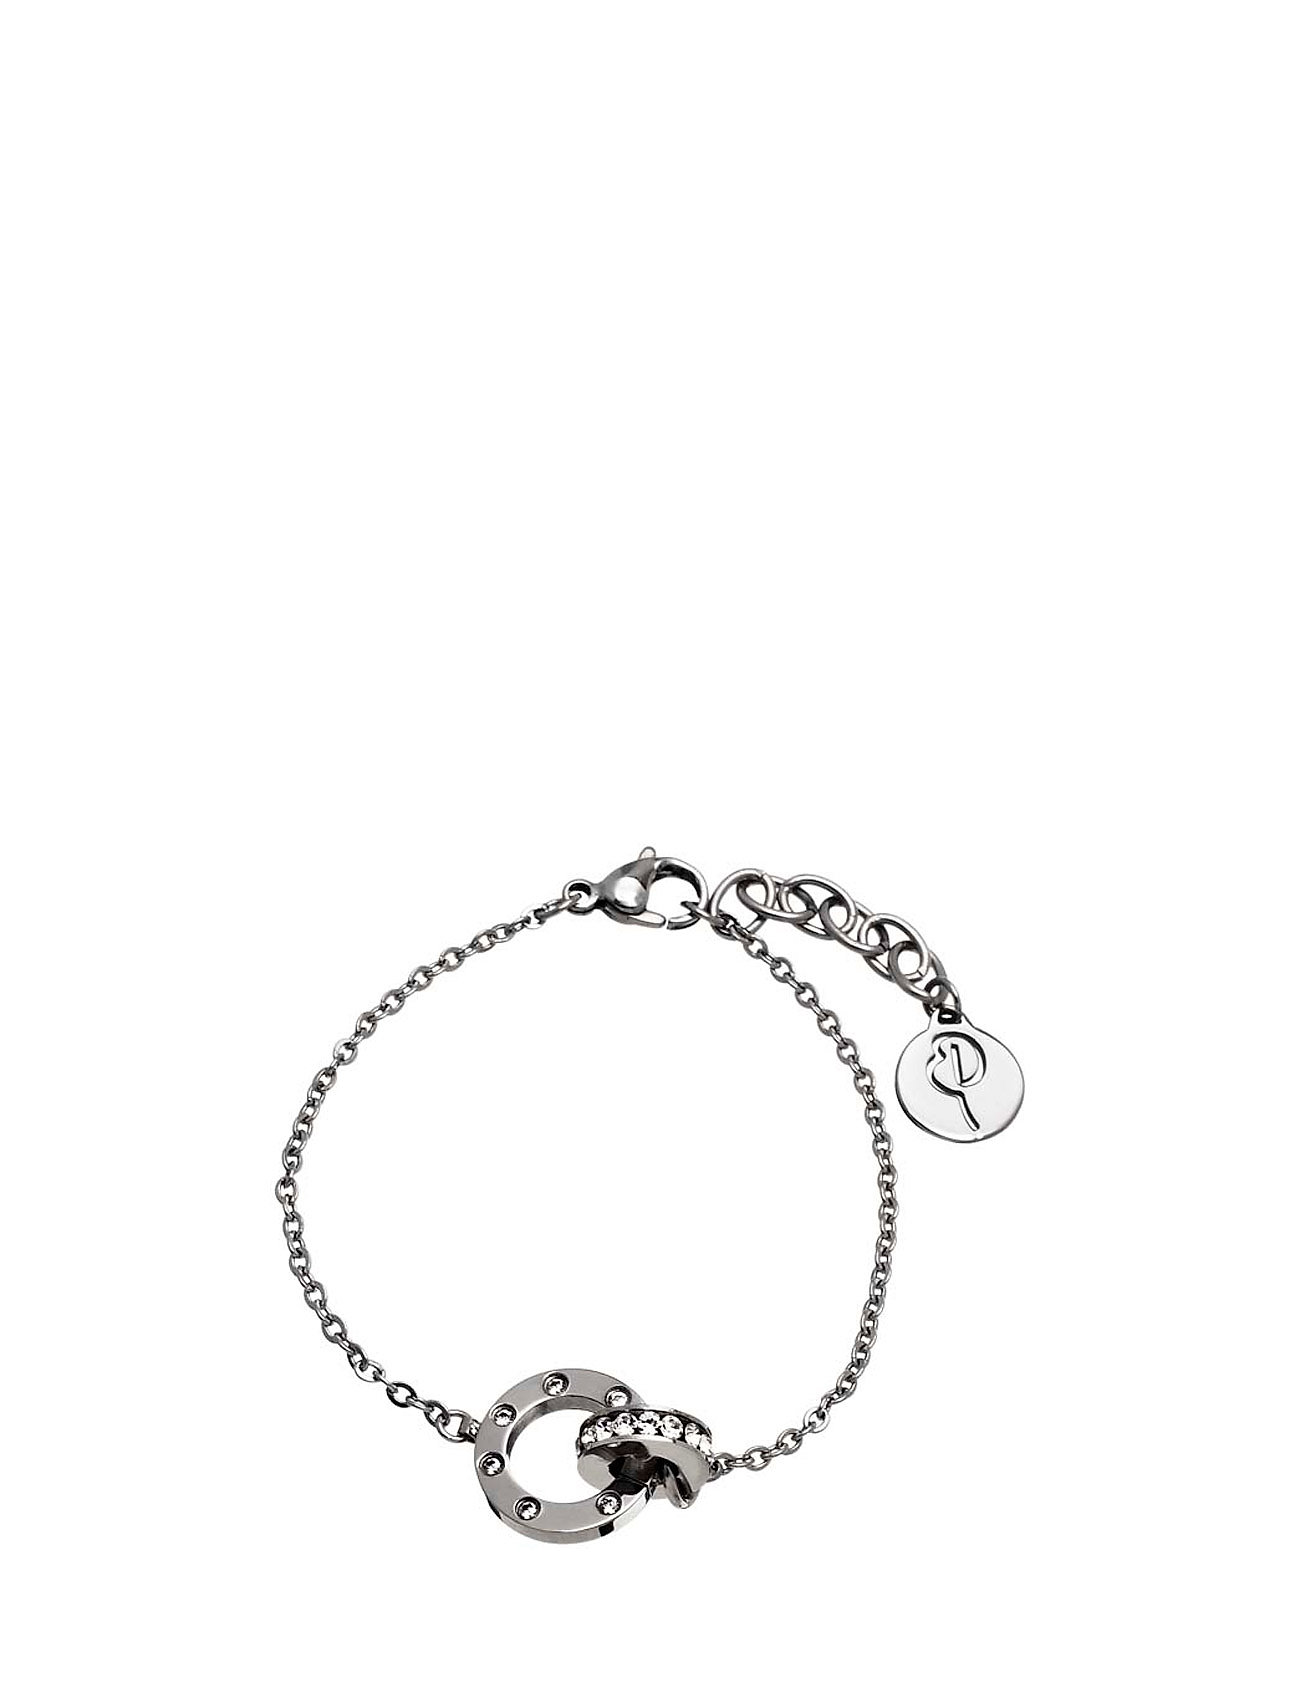 edblad – Ida bracelet mini på boozt.com dk